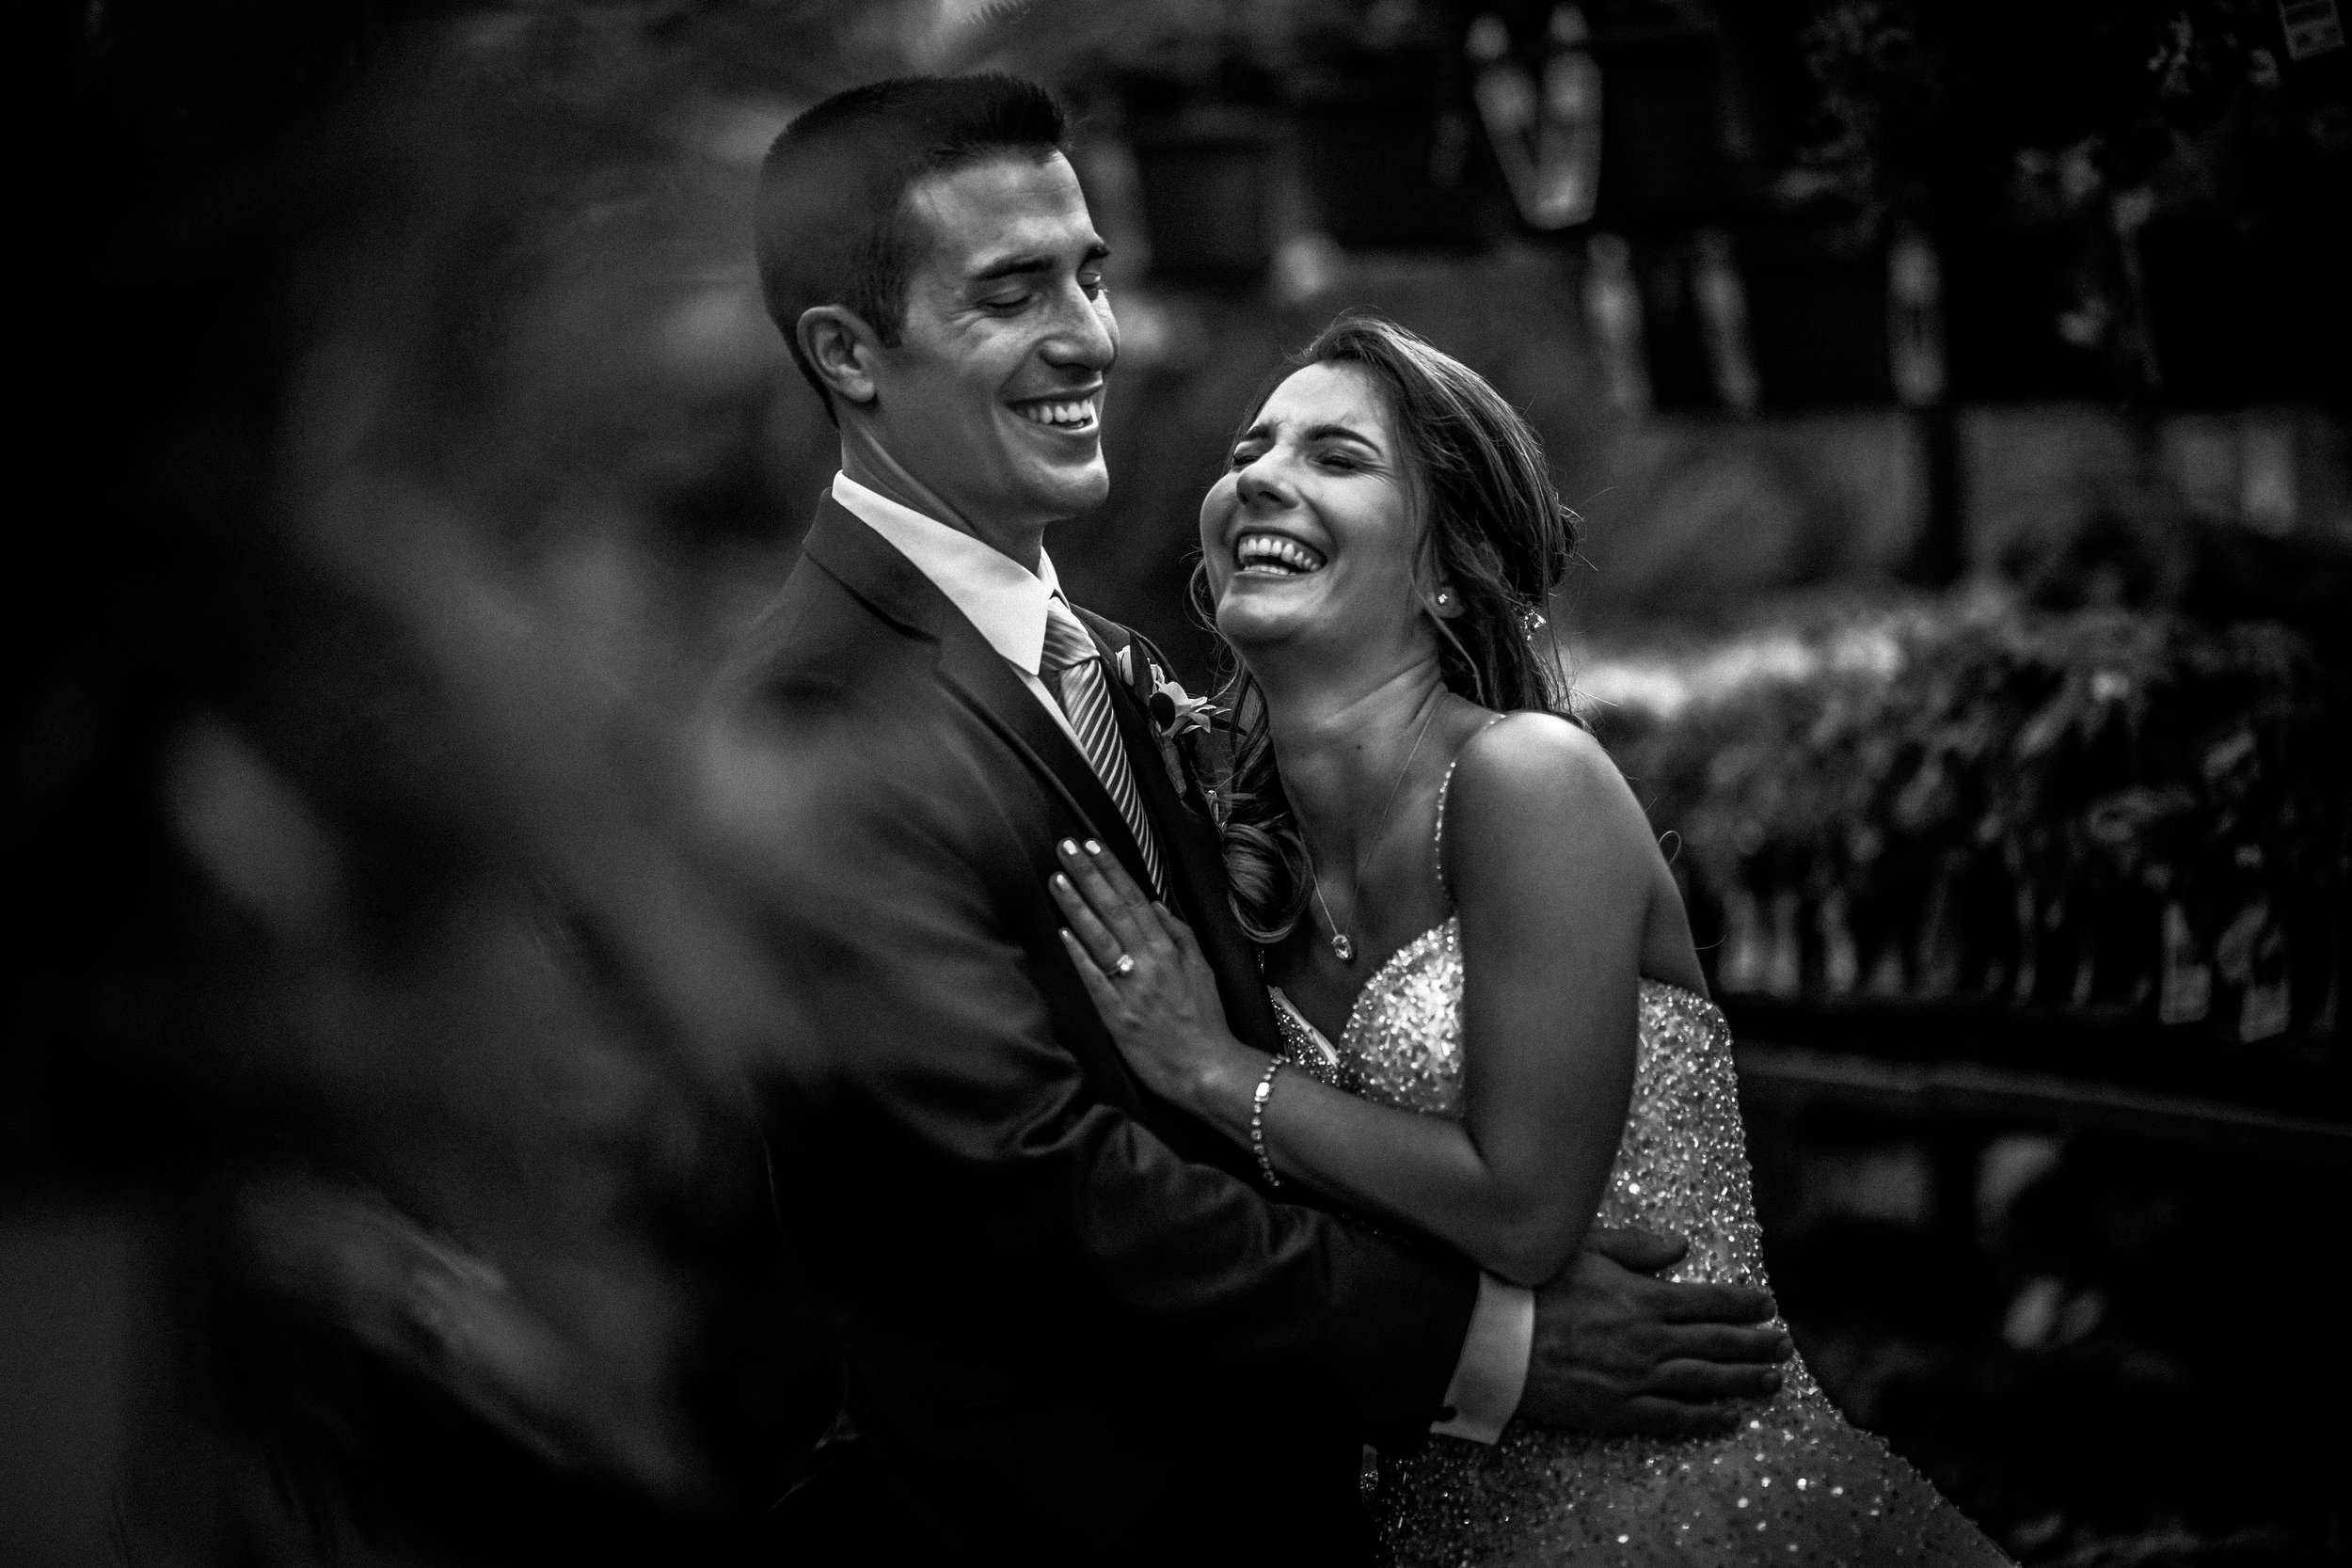 Wedding-couple-takes-photos-at-lowes-hardware-due-to-rain17.jpg